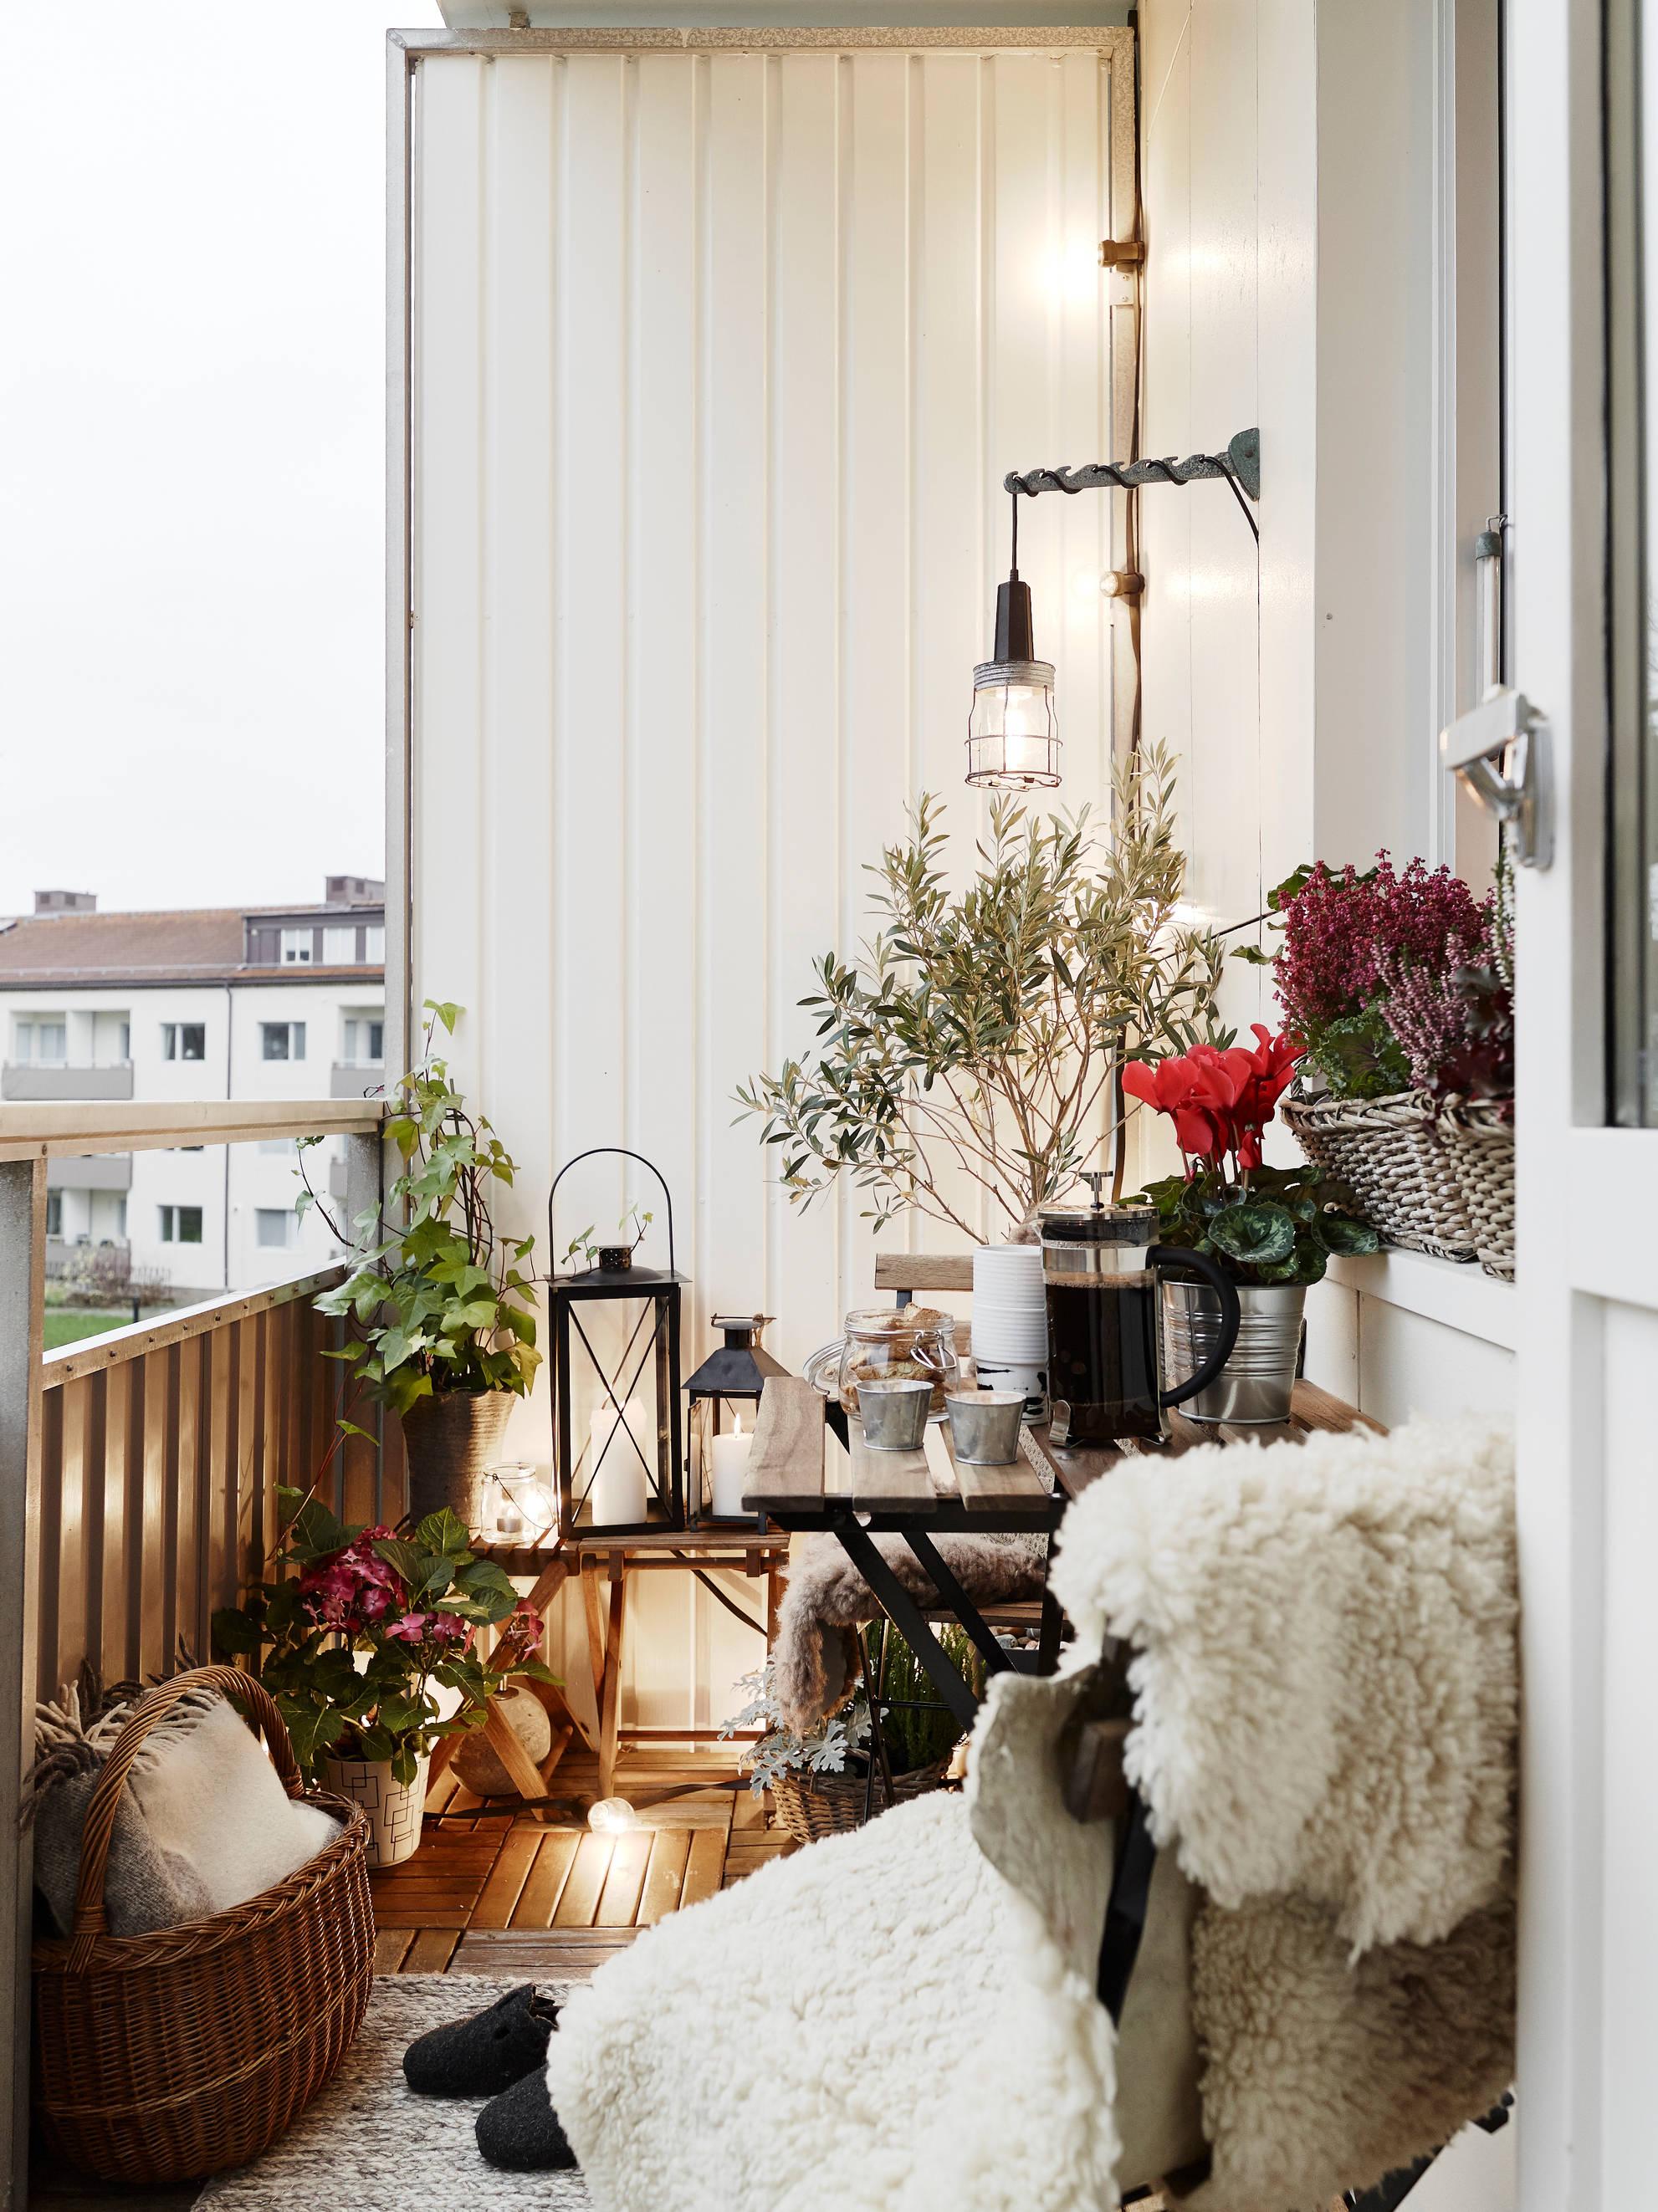 Open balcony ideas - Viskas apie interjerą